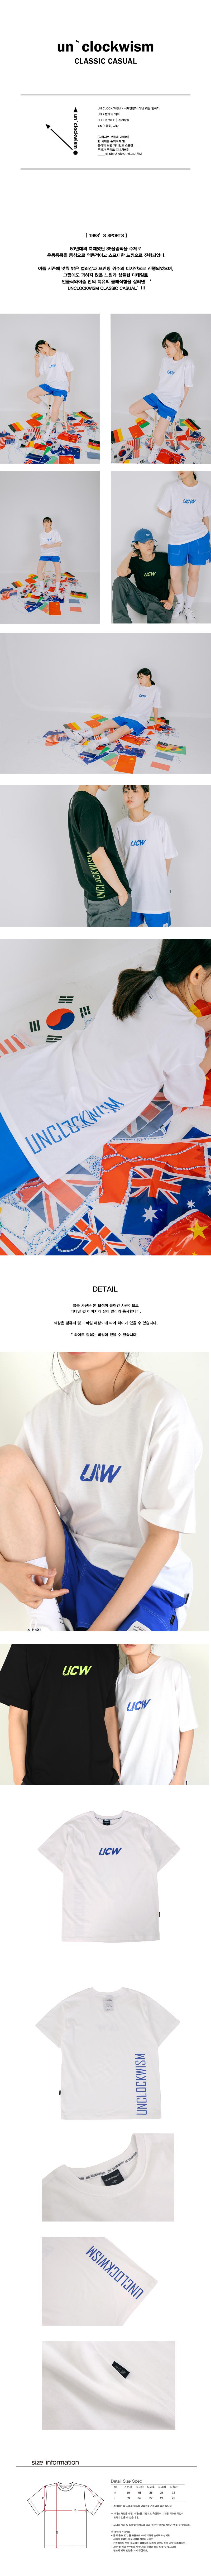 UCW Logo Back Side Printing t-shirt_white.jpg